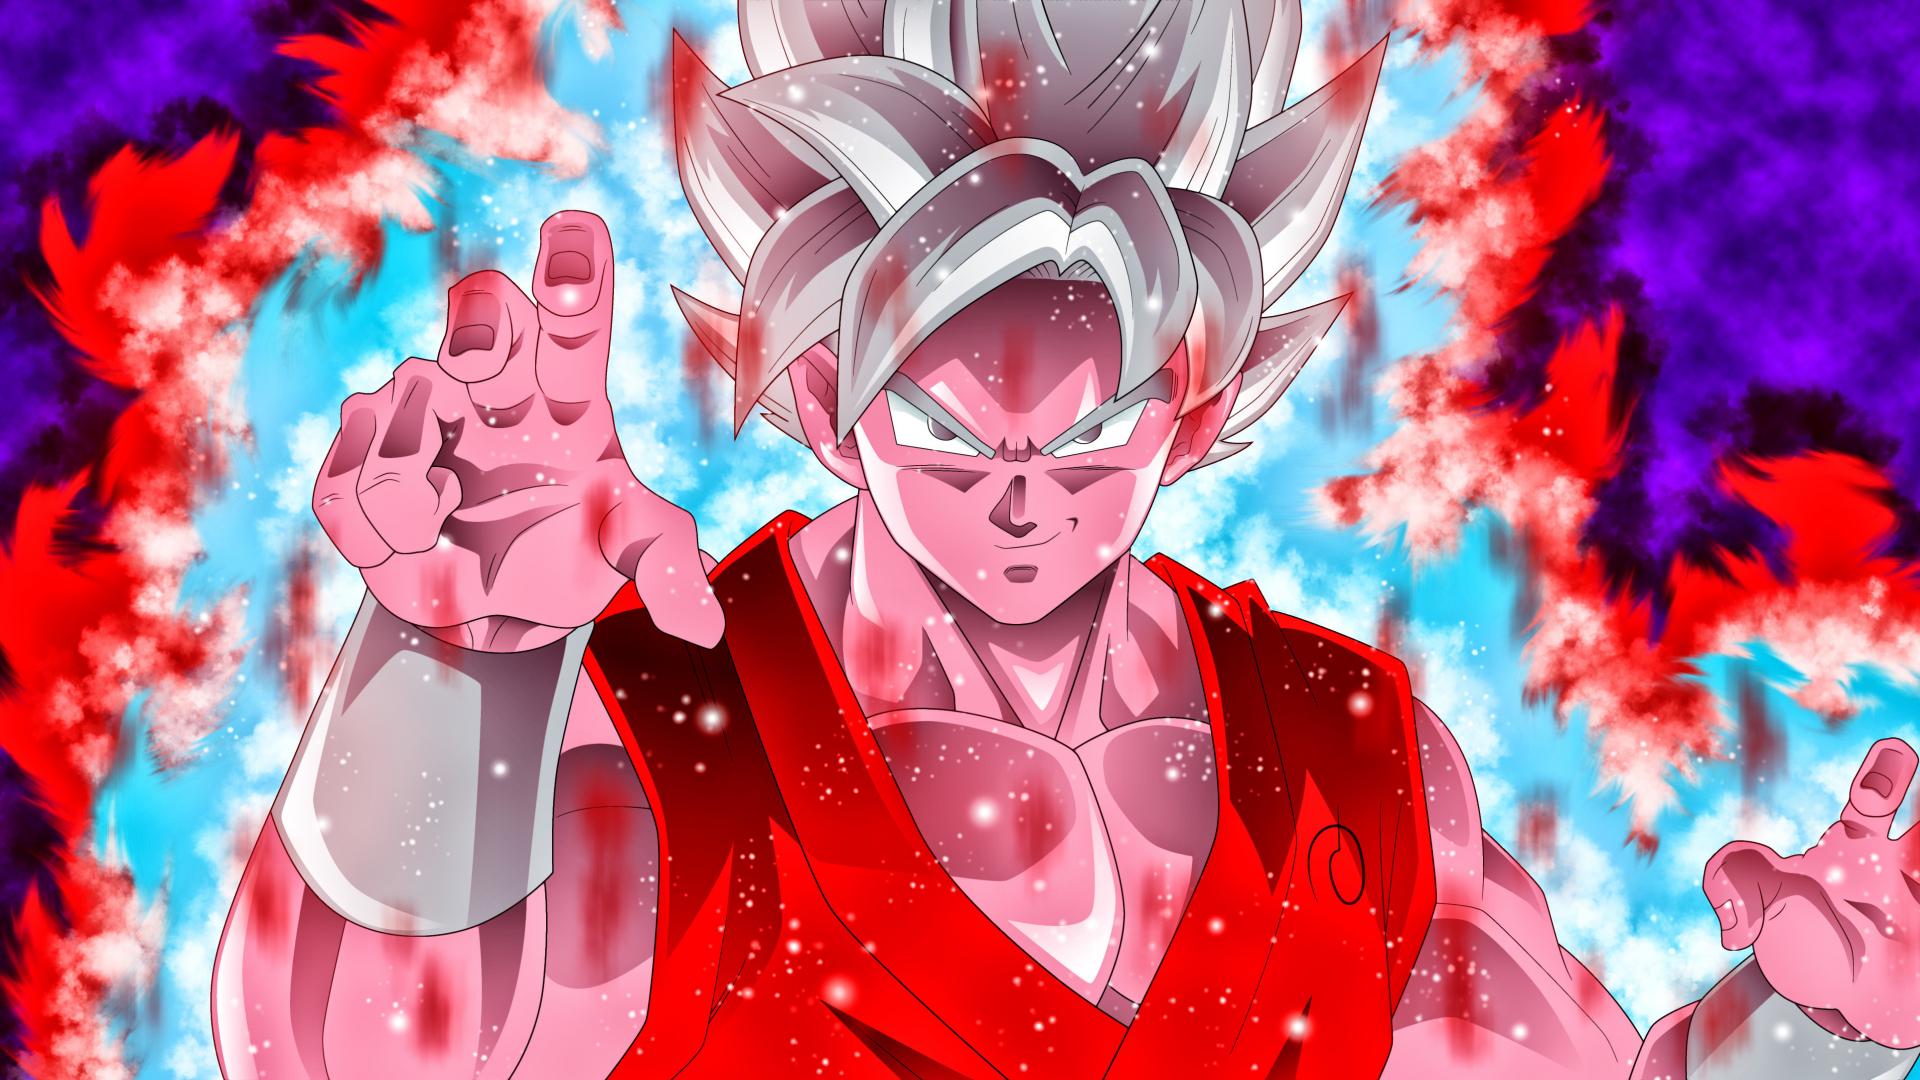 Download 1920x1080 Wallpaper Dragon Ball Super Goku 4k Full Hd